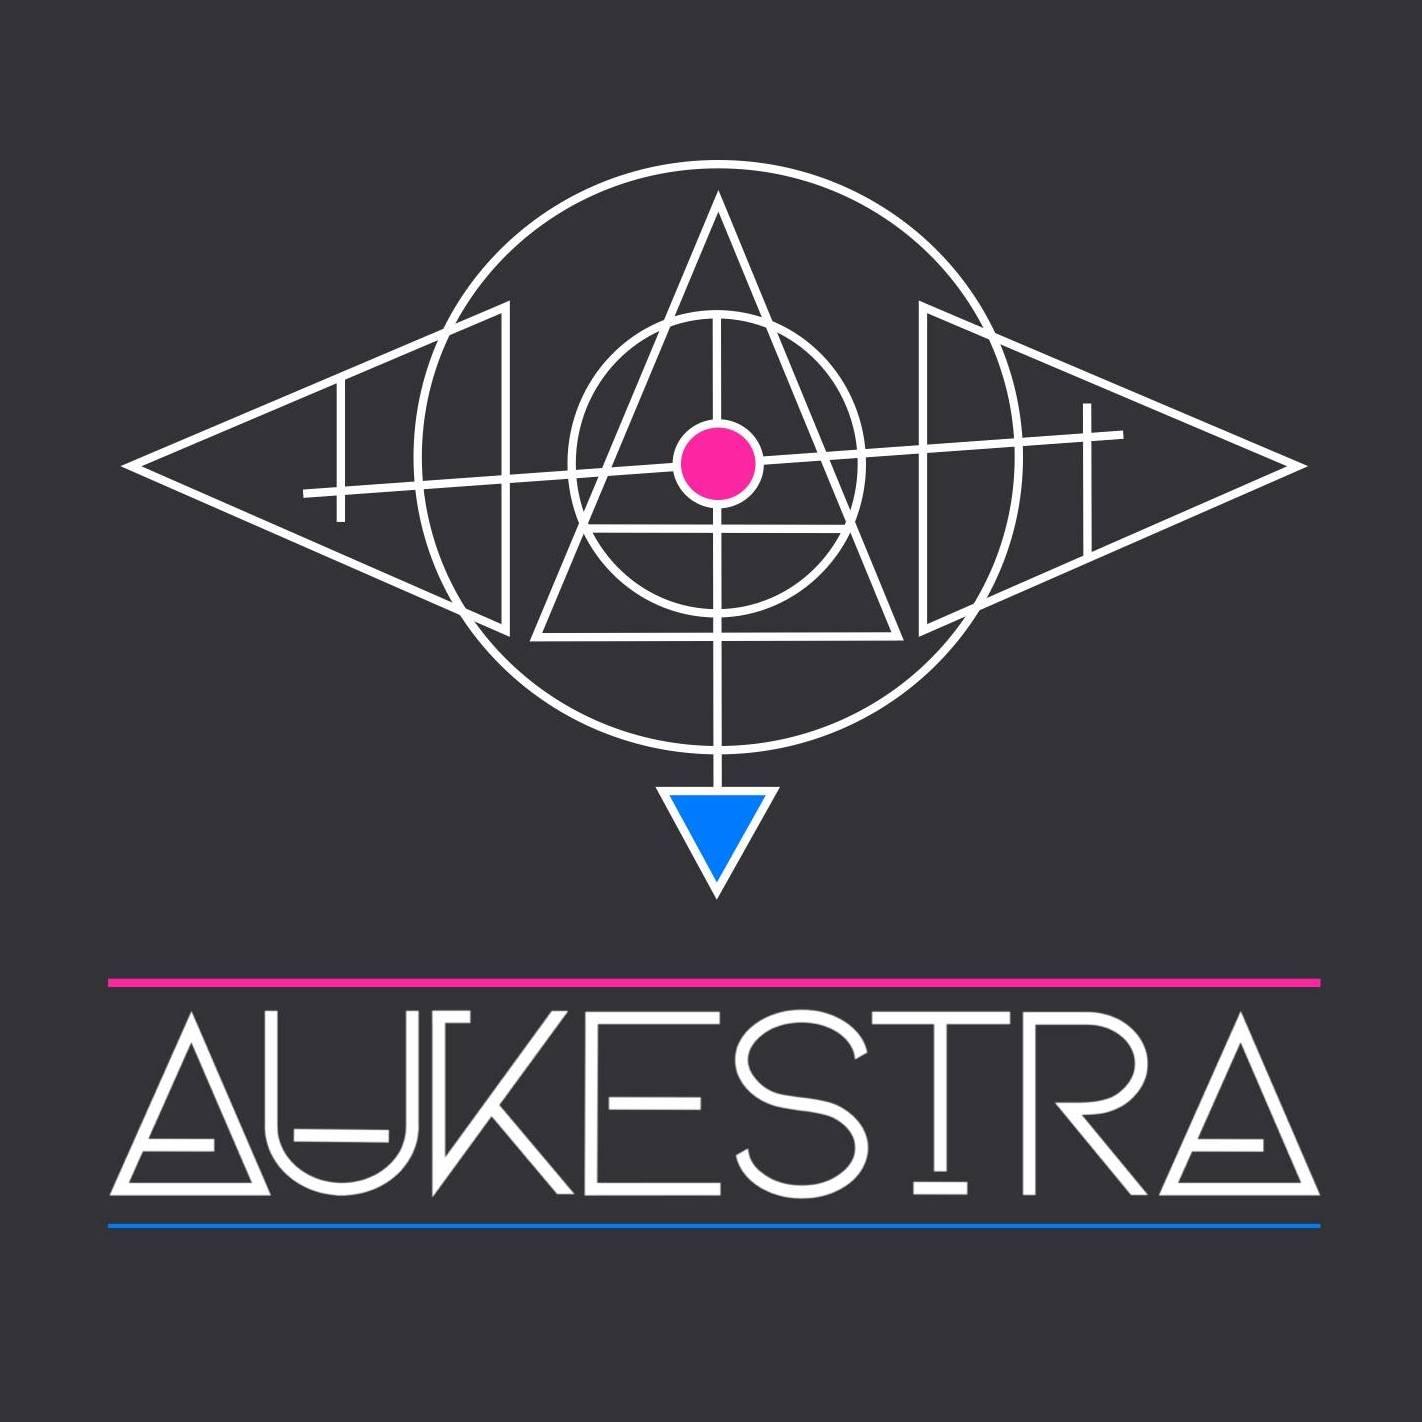 Aukestra